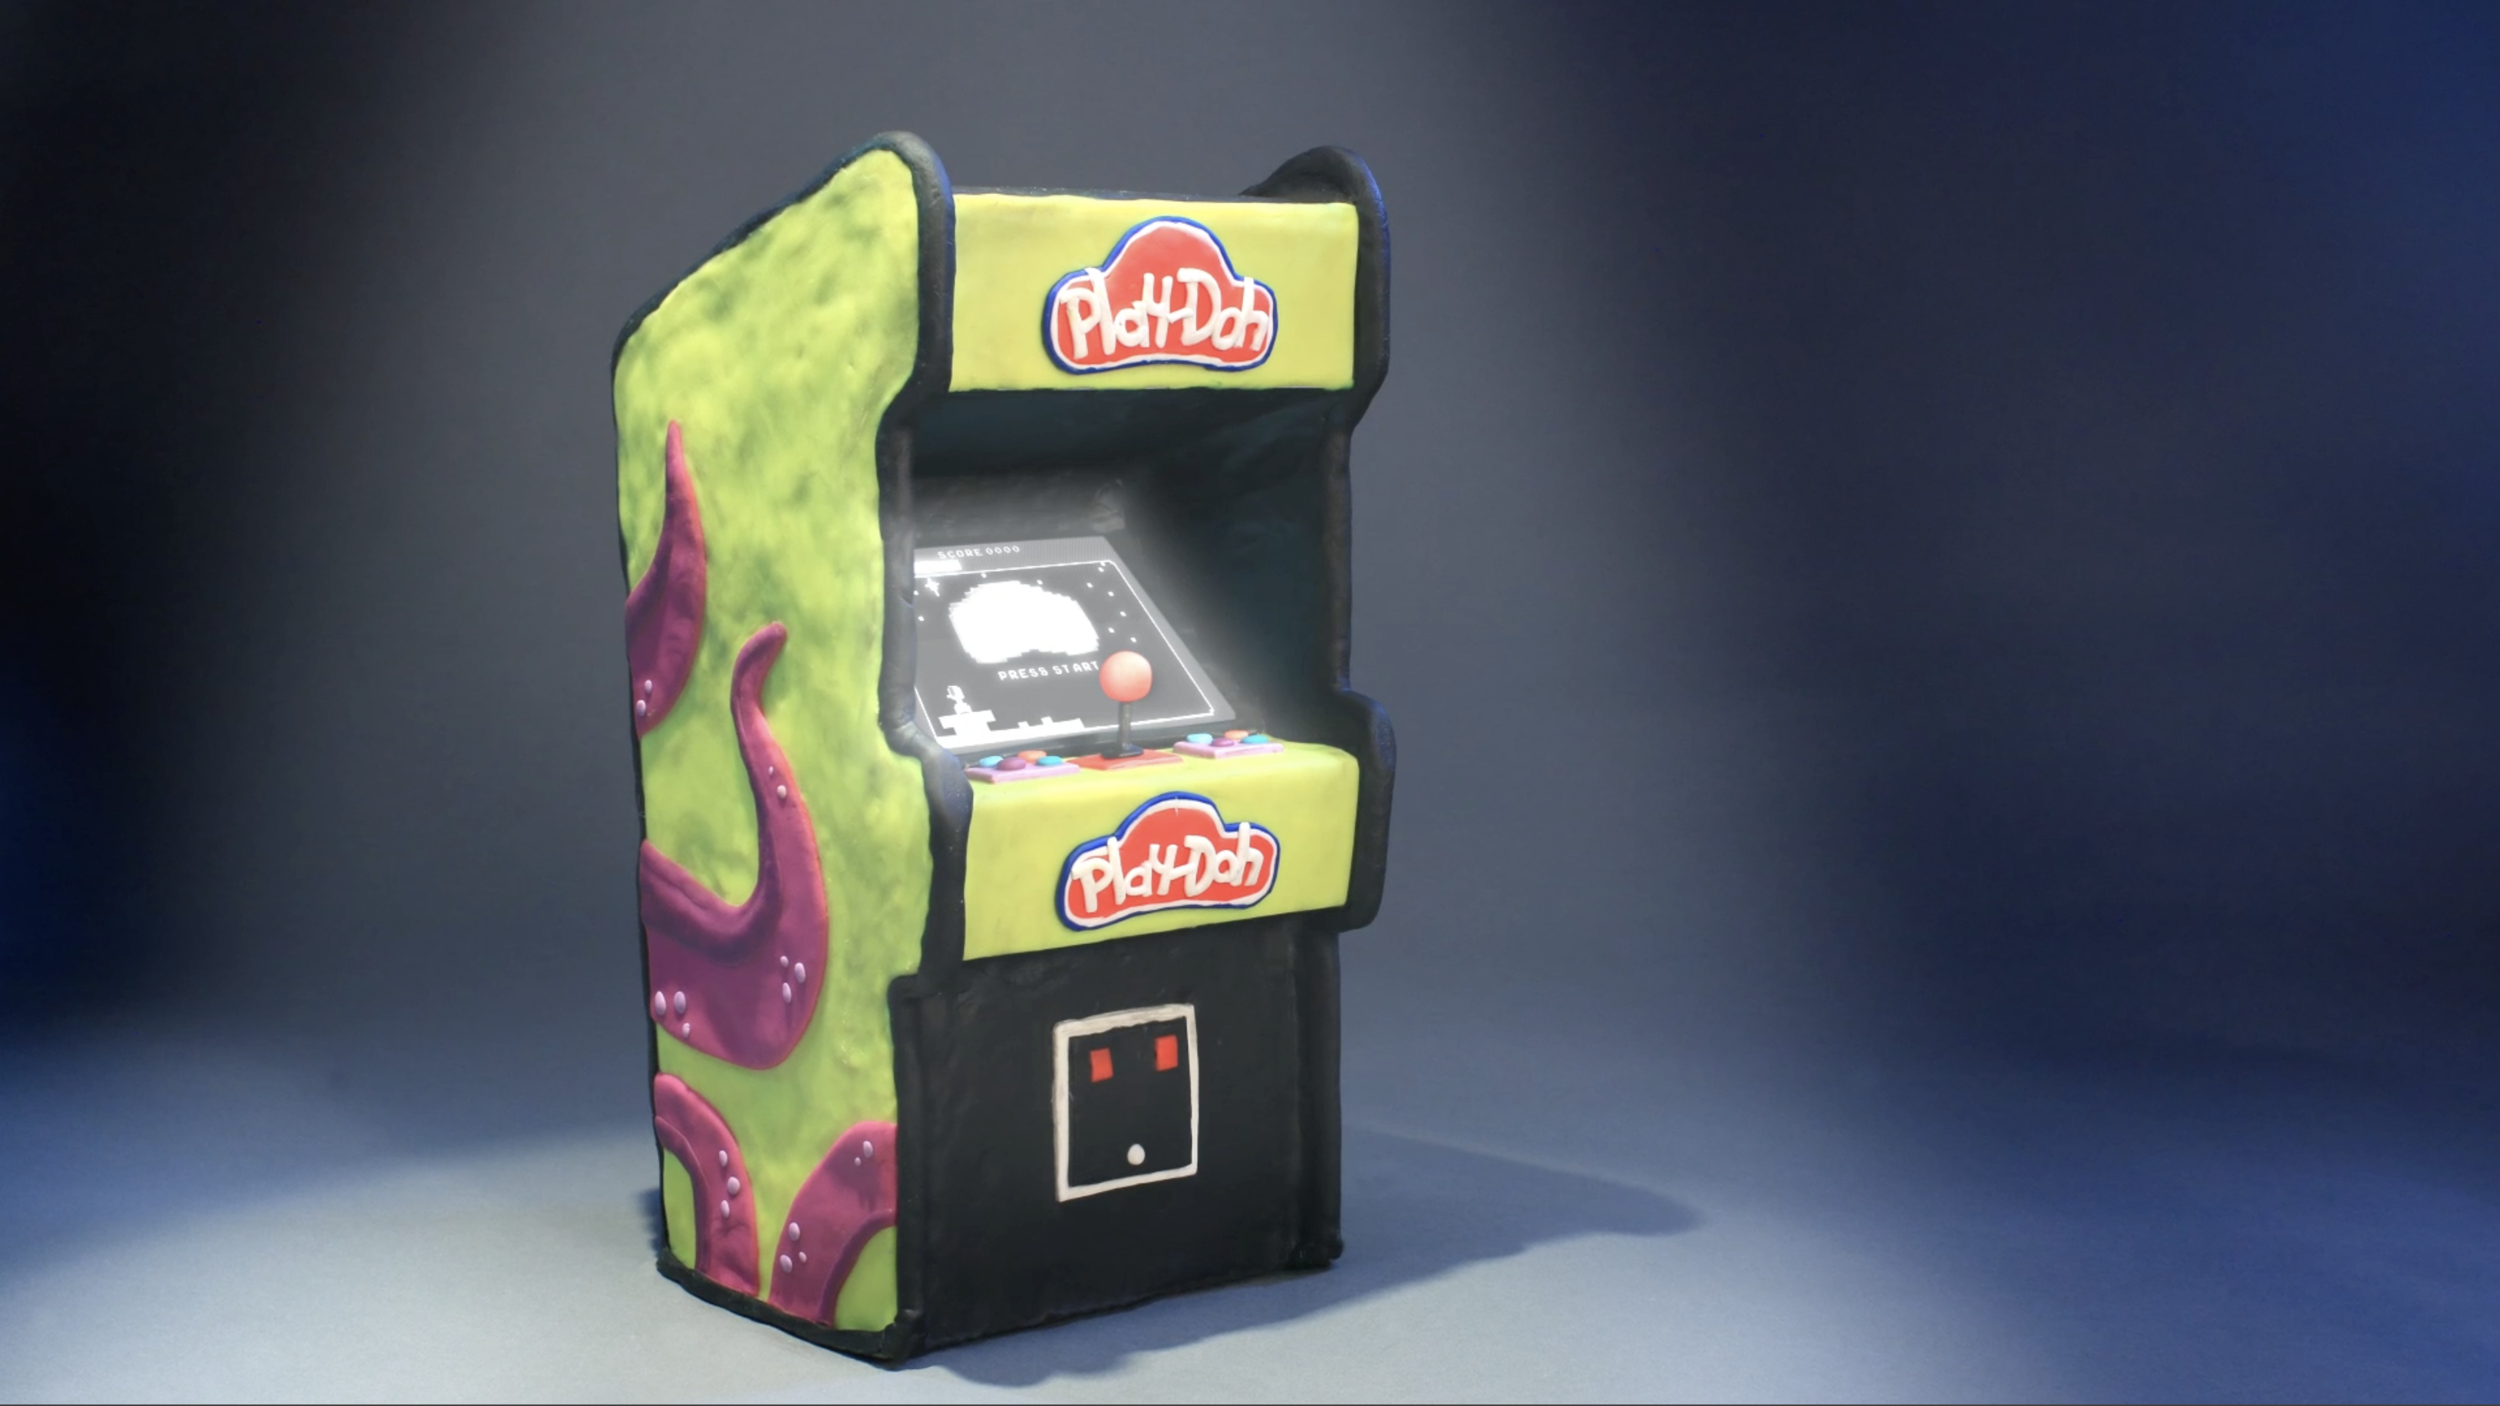 Play-Doh: '8-bit'